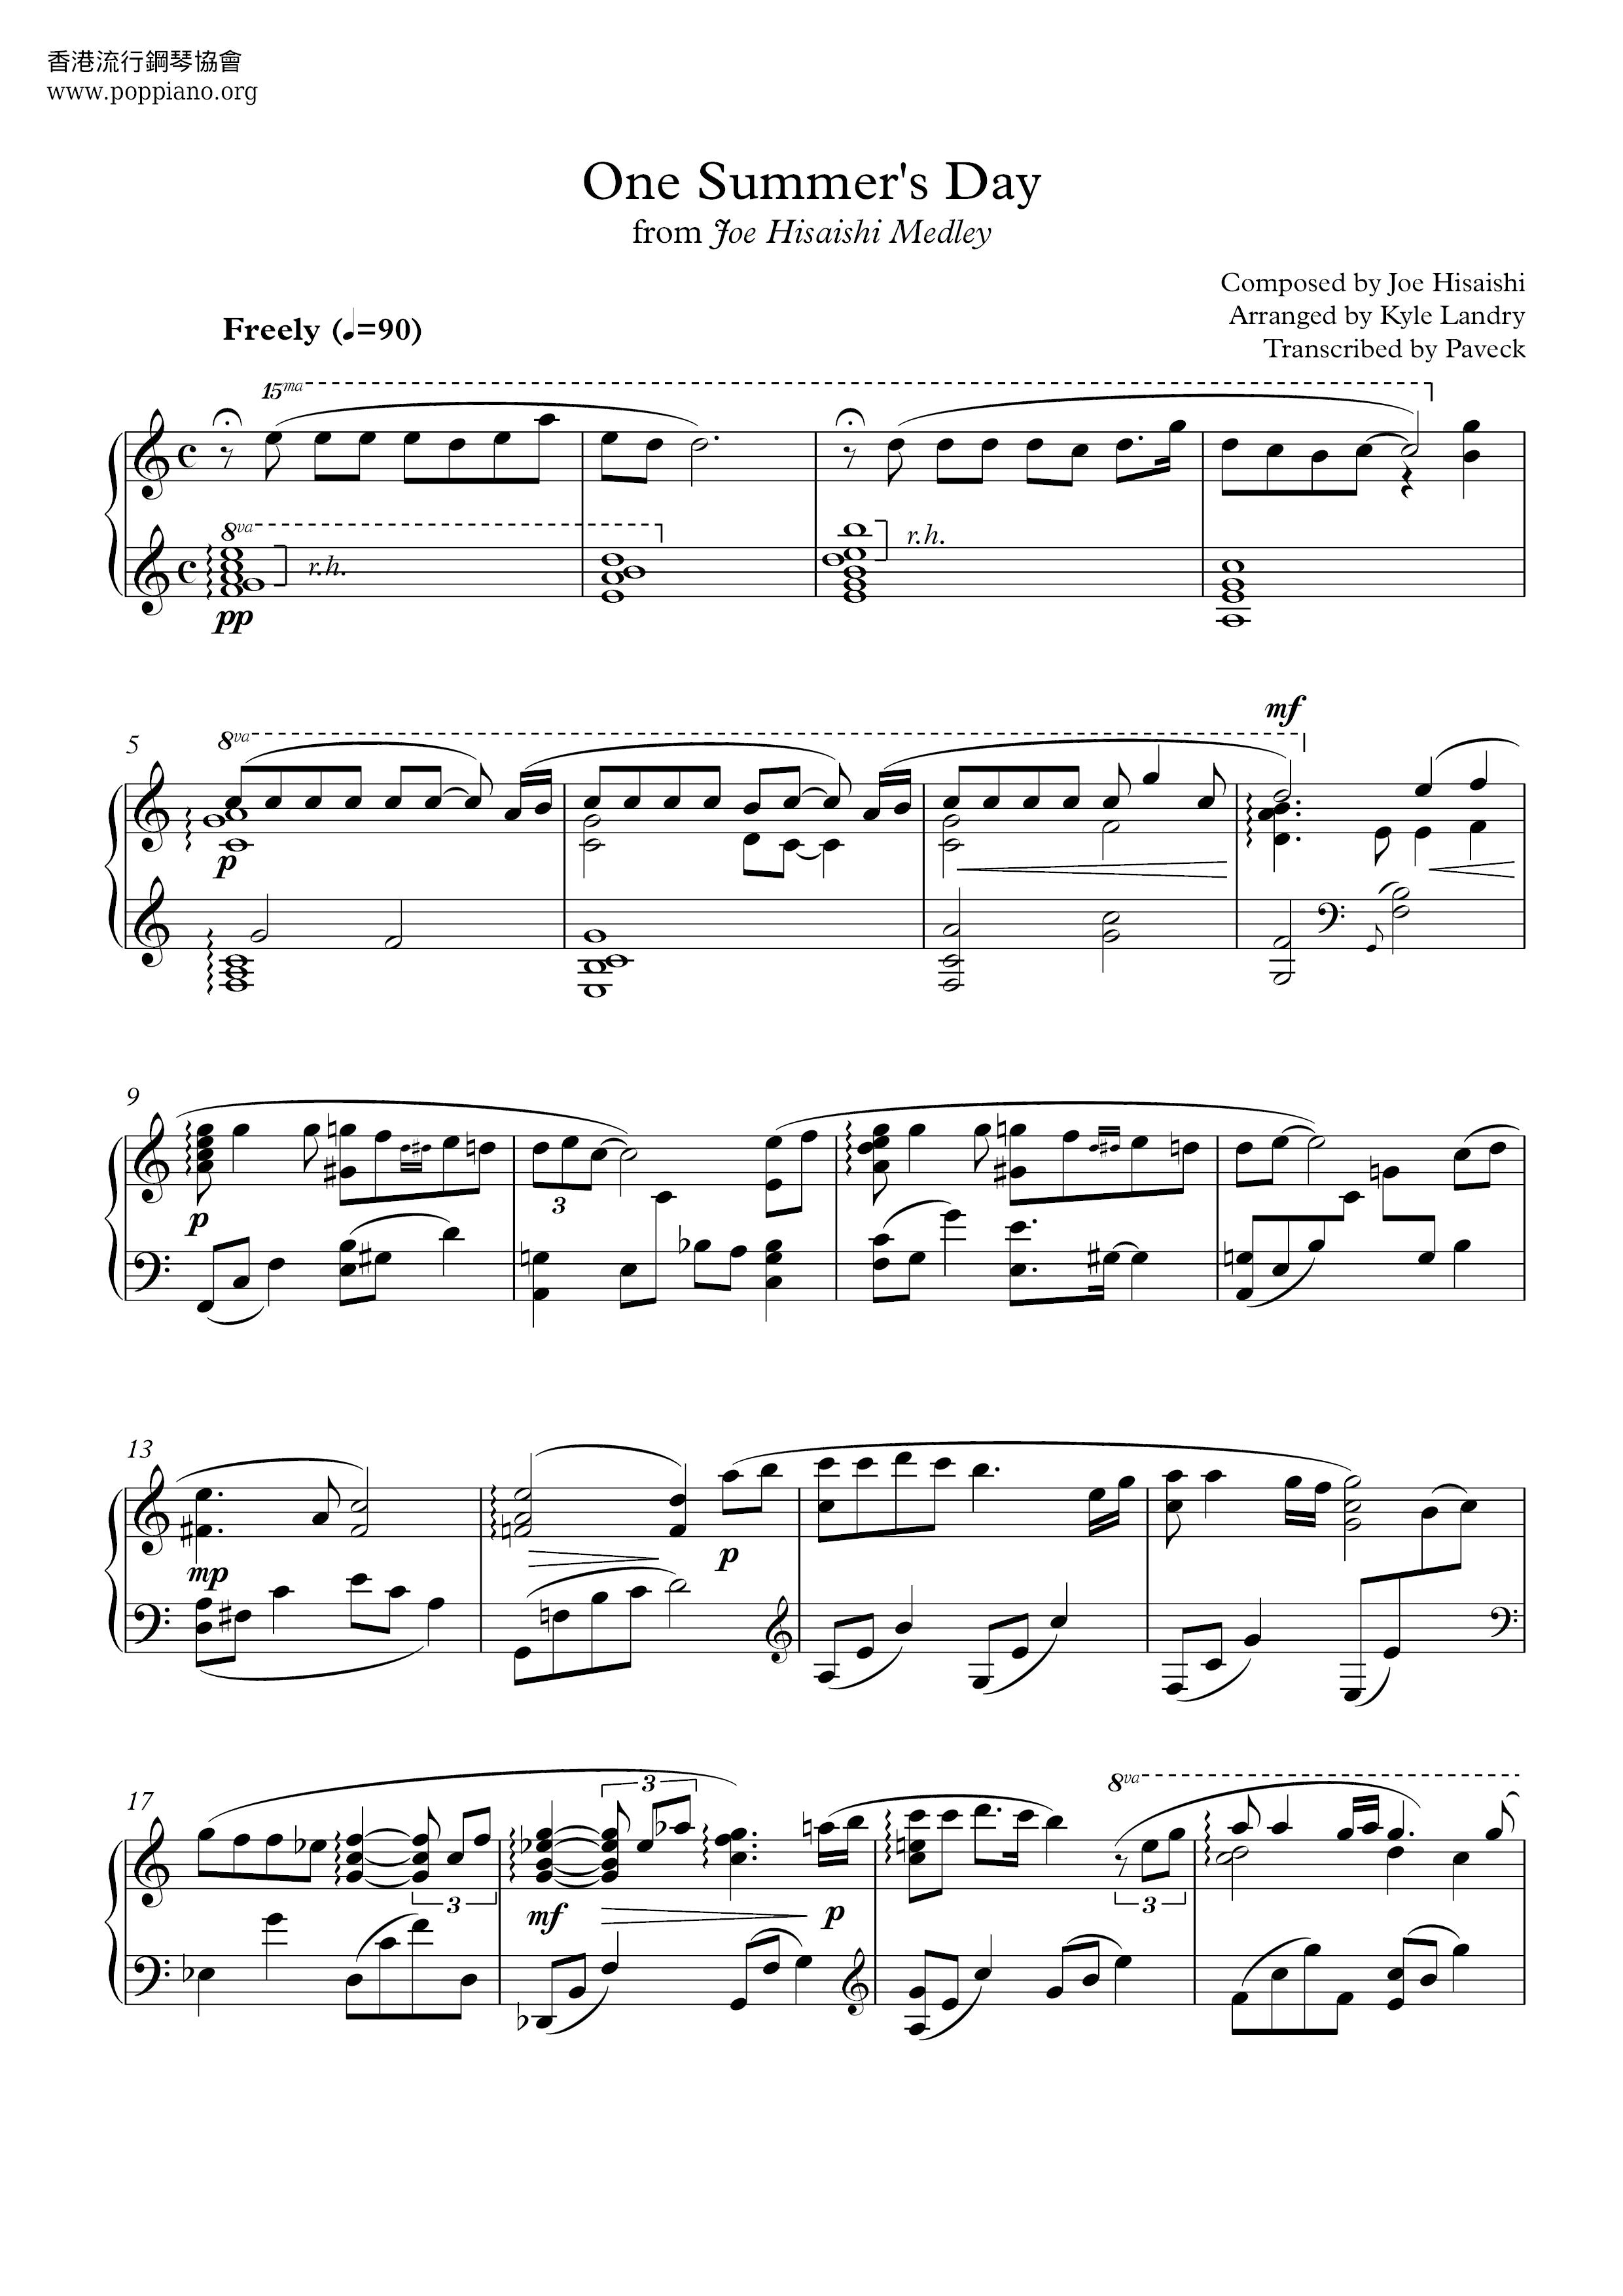 Joe Hisaishi Spirited Away One Summer S Day Sheet Music Pdf あの夏へ 악보 楽譜 ひさいしじょう Free Score Download